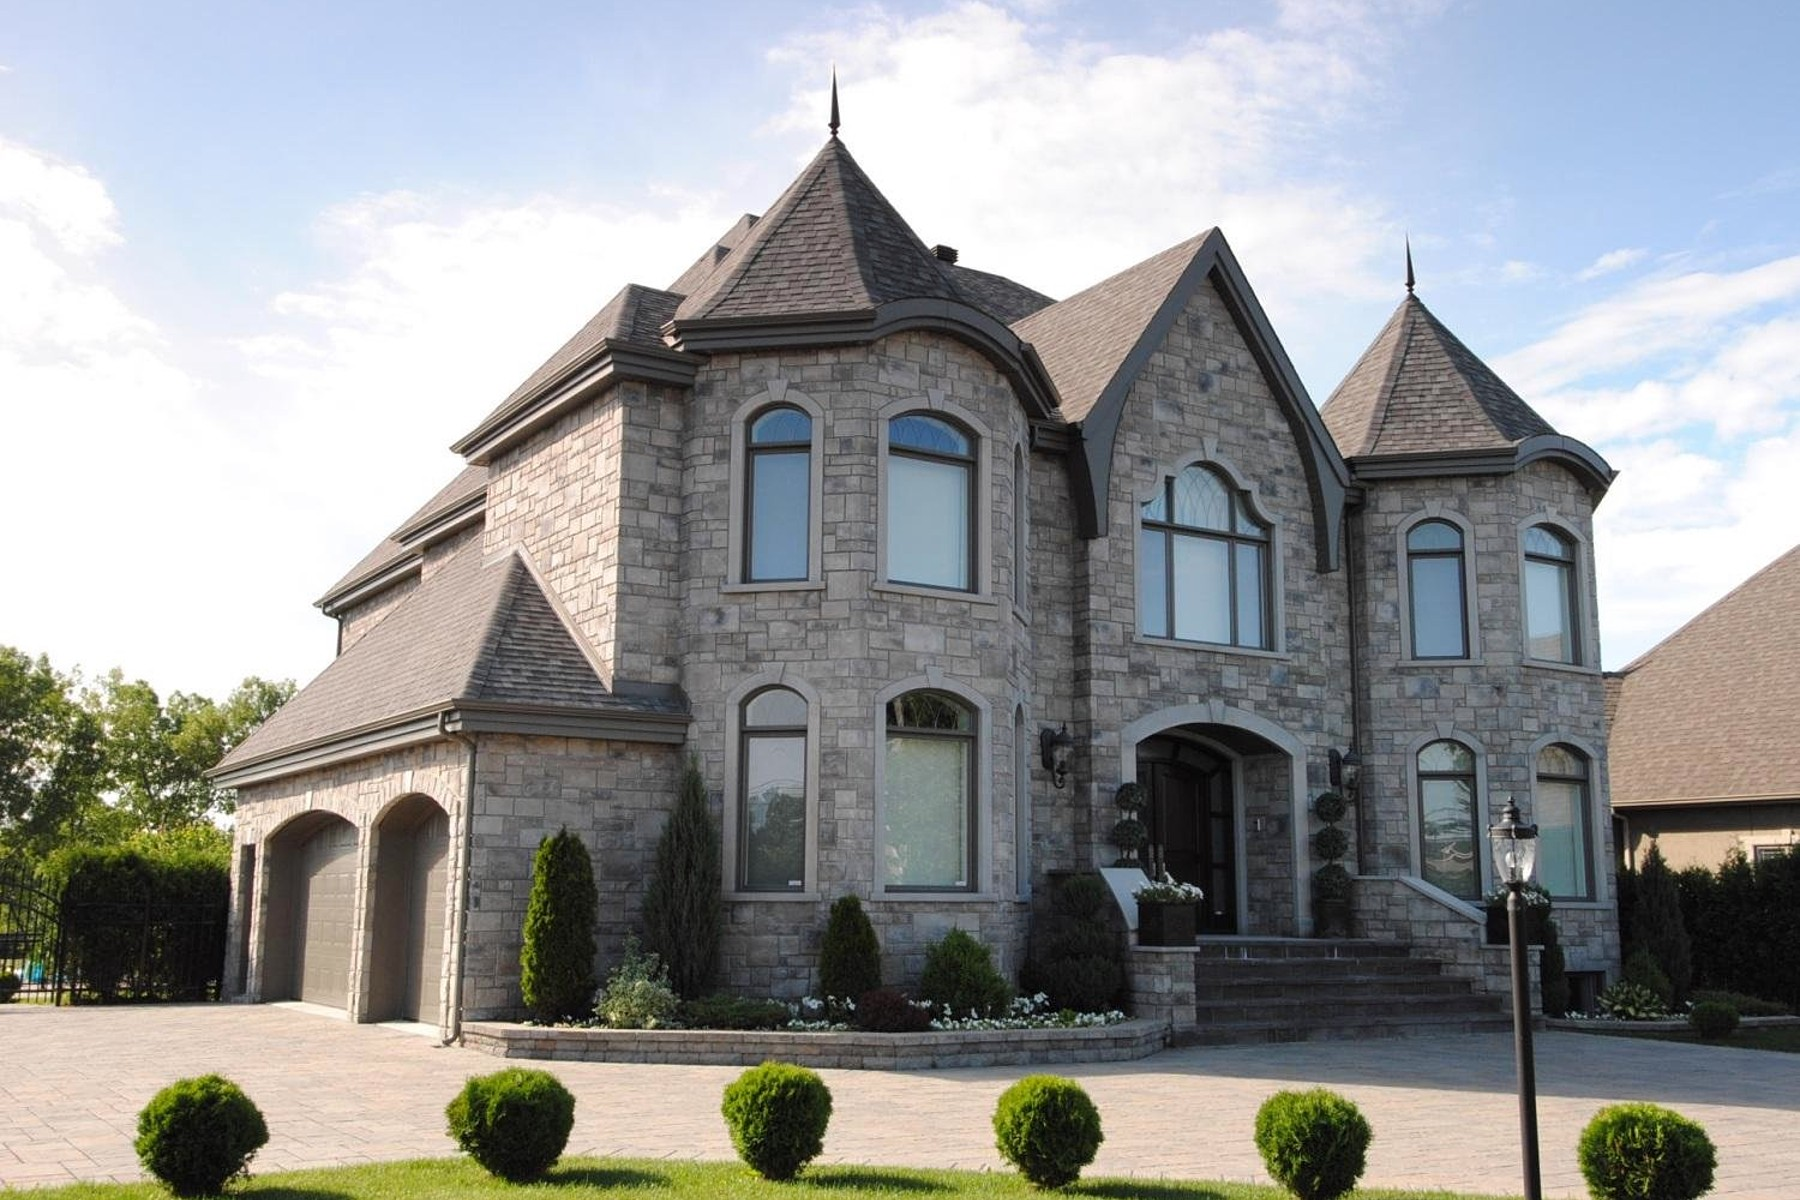 Other Residential for Sale at Le Gardeur (Repentigny), Lanaudière 32 Boul. Lacombe Le Gardeur, Quebec J5Z1R4 Canada